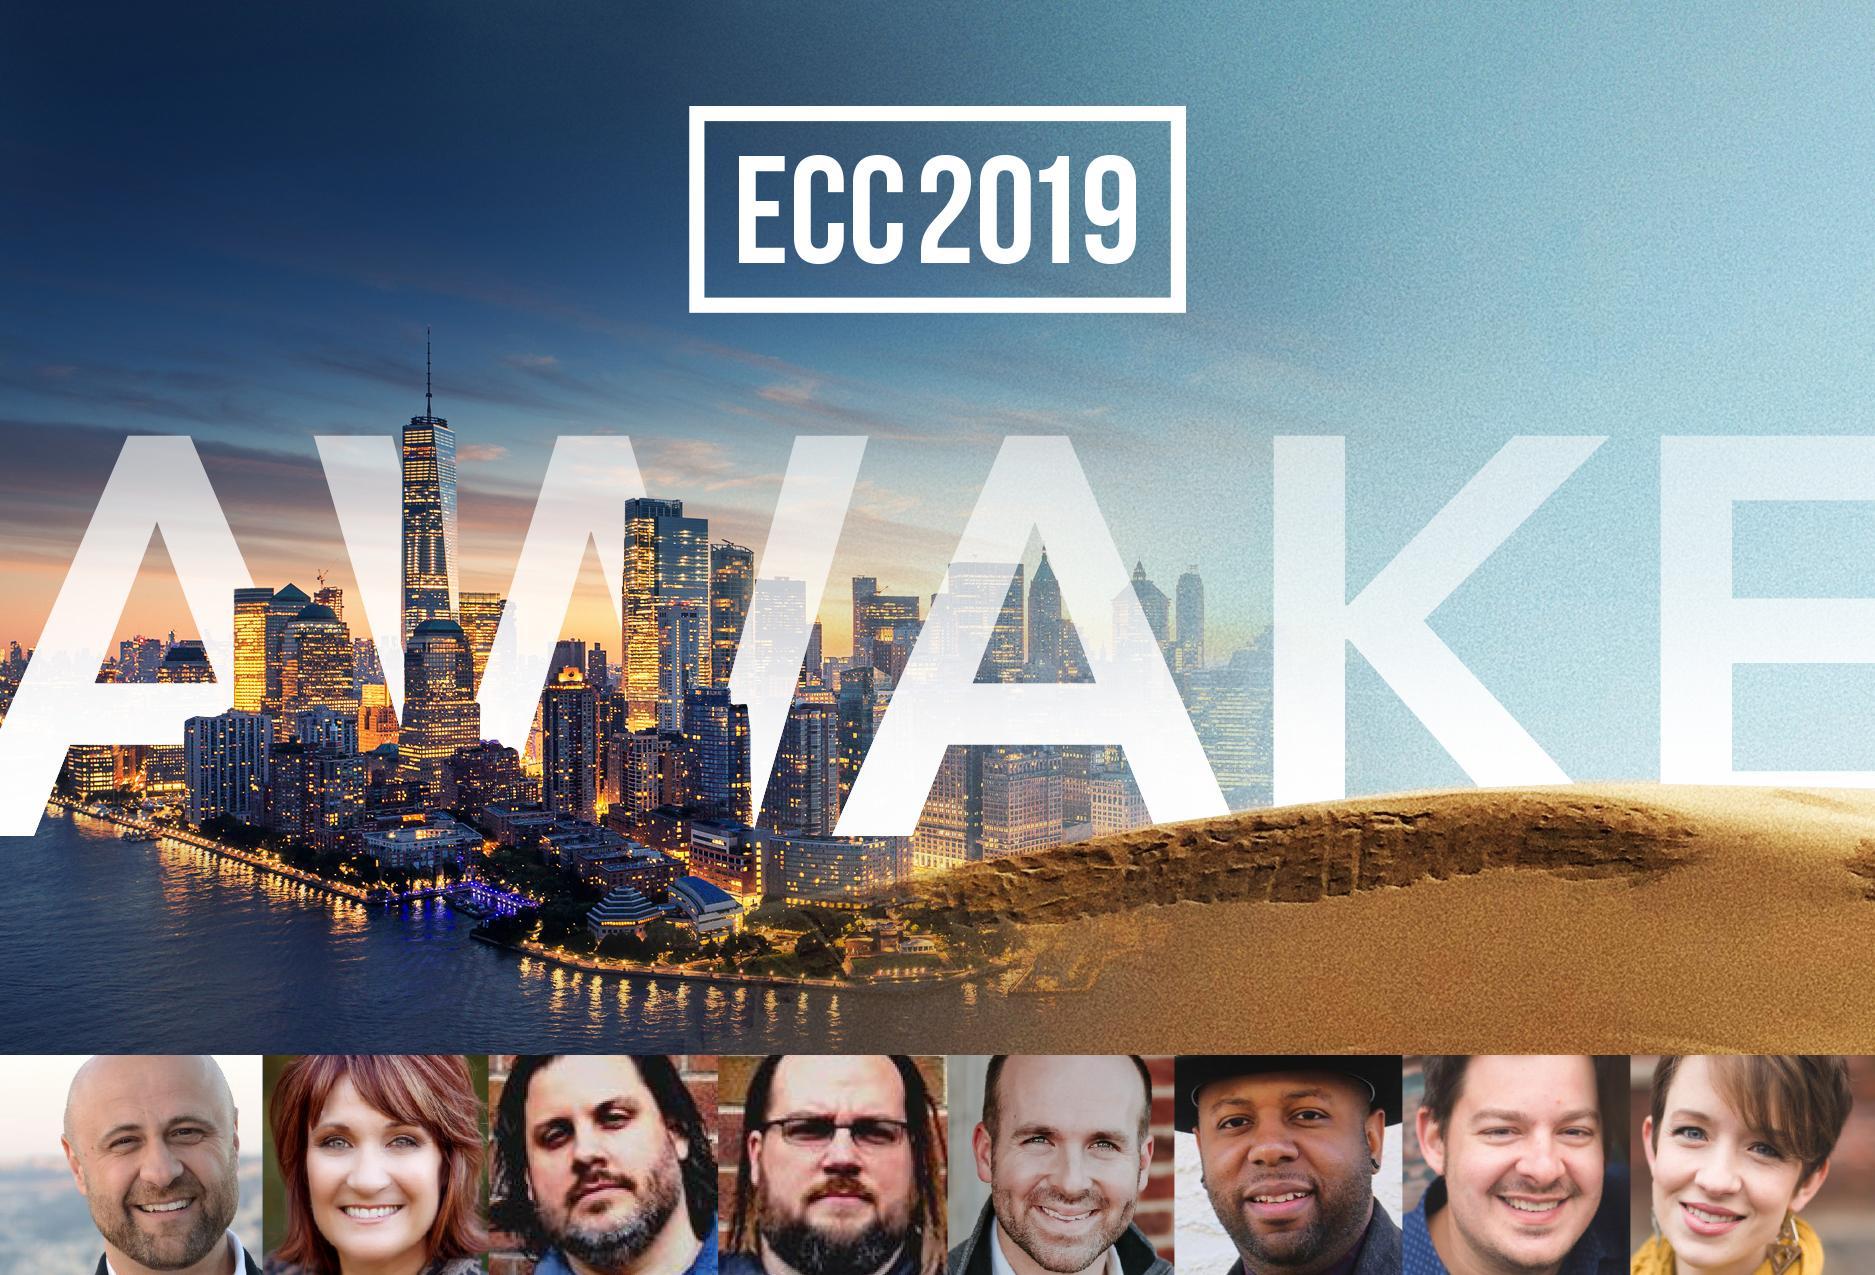 AWAKE ECC 2019